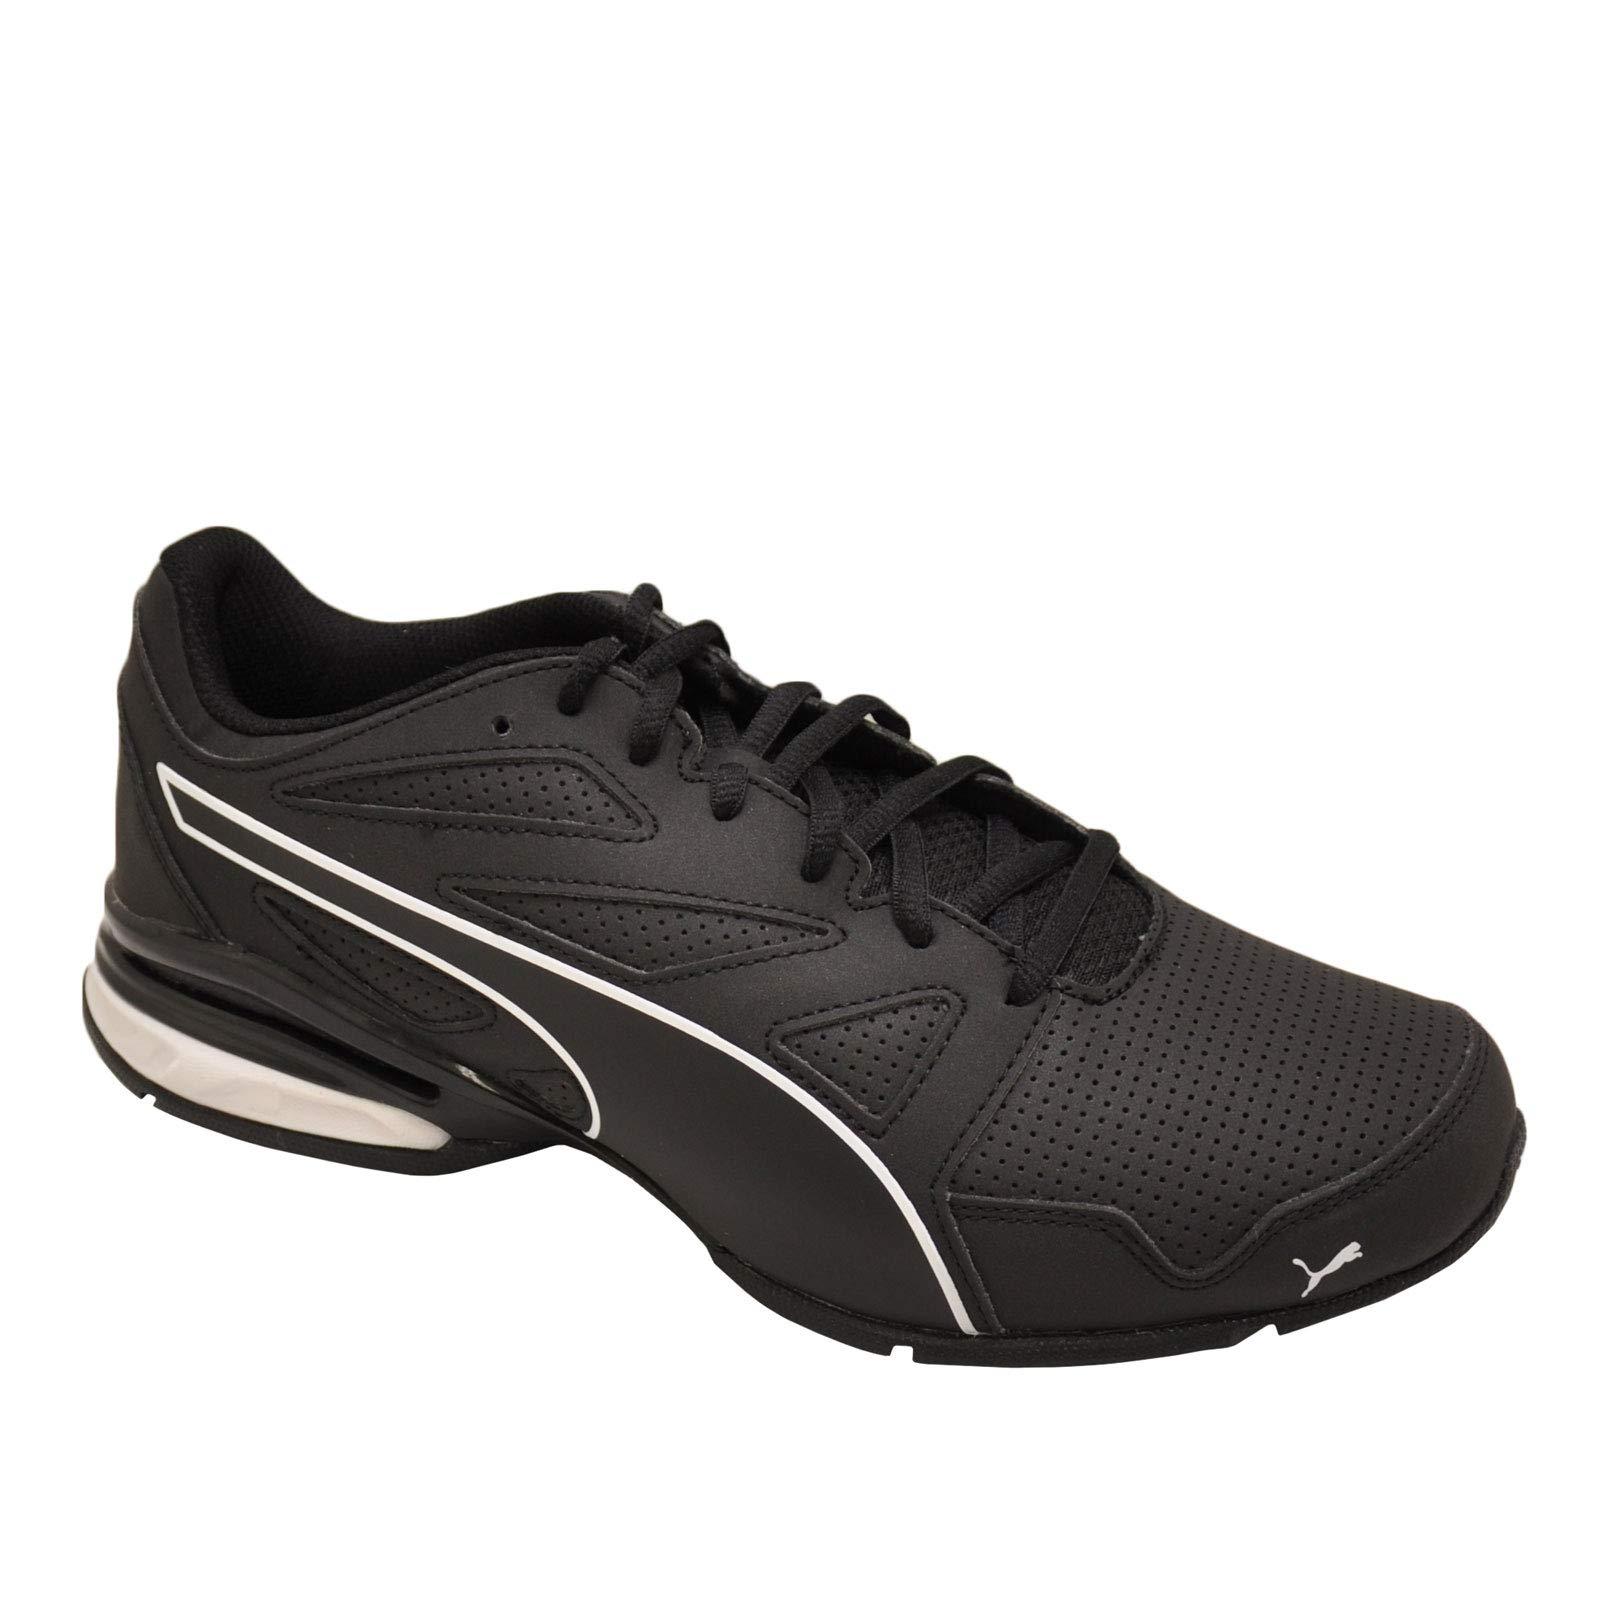 new product 38073 1cb70 Galleon - PUMA Men s Tazon Modern SL FM Sneaker, Black White, 10 M US